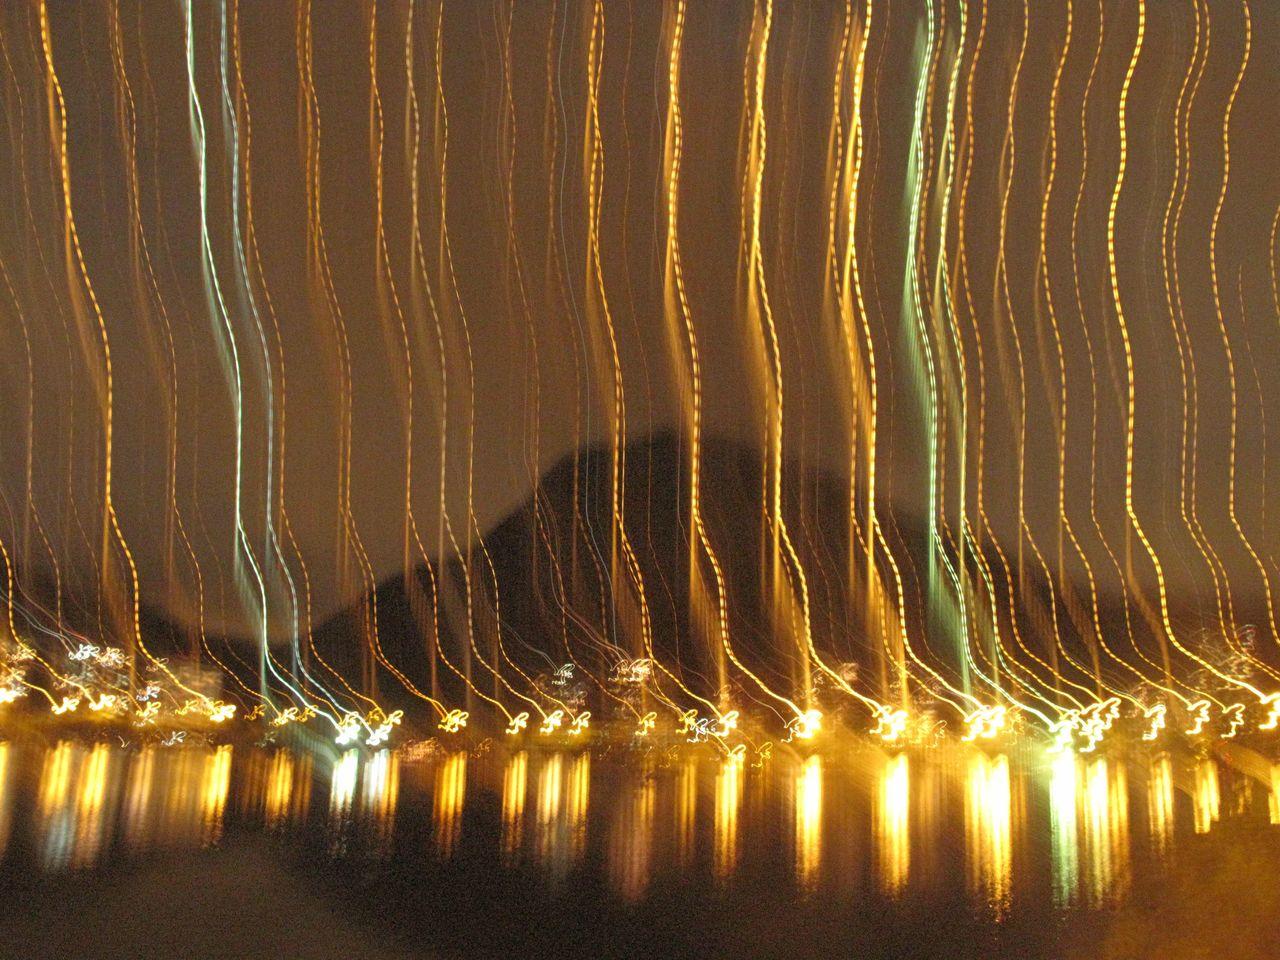 illuminated, water, reflection, no people, pattern, night, nature, waterfront, beauty in nature, scenics - nature, motion, glowing, outdoors, long exposure, light - natural phenomenon, hanging, architecture, idyllic, yellow